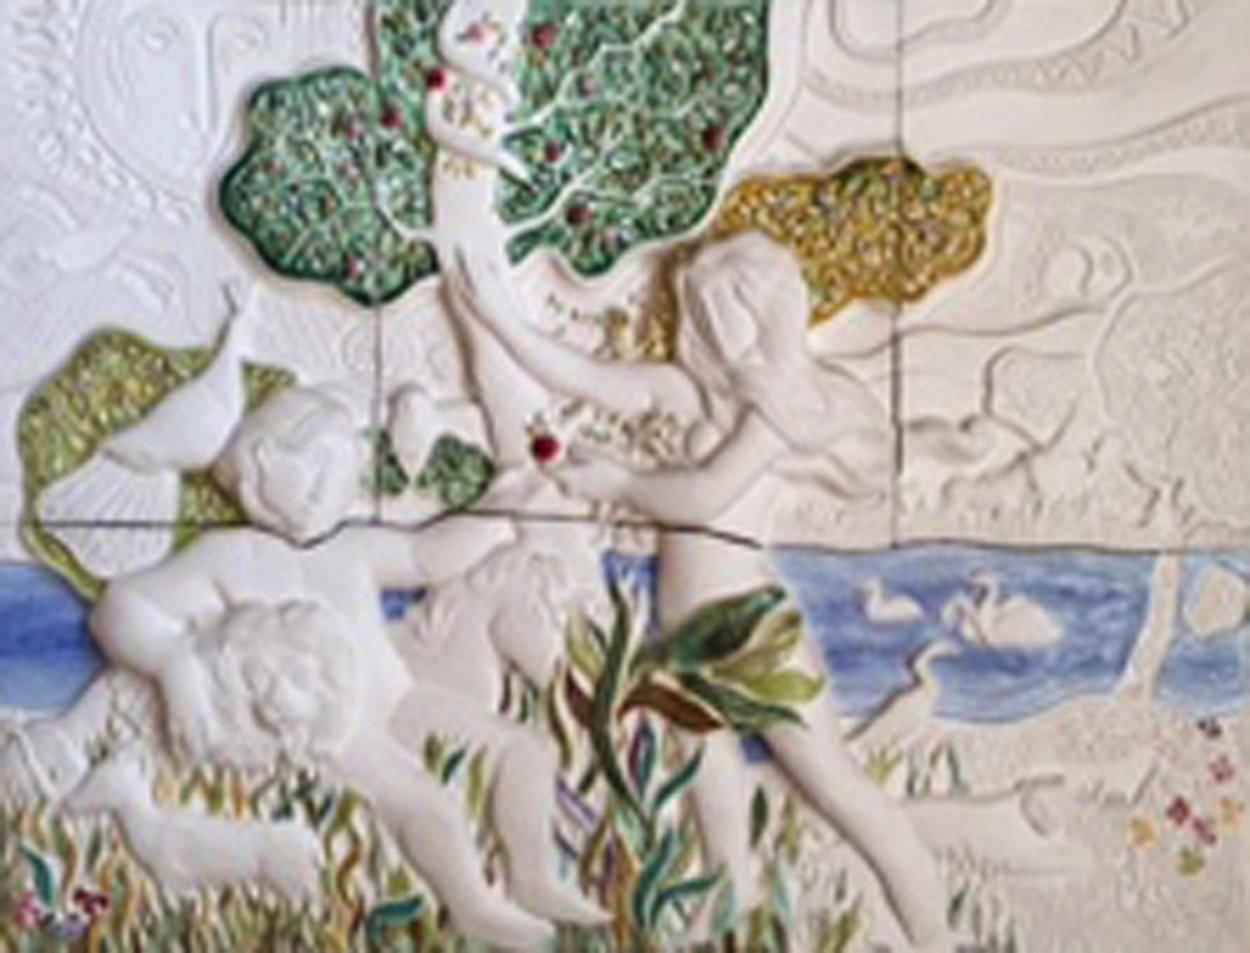 Garden of Eden Ceramic Sculpture 37x46  Huge Sculpture by Sunol Alvar